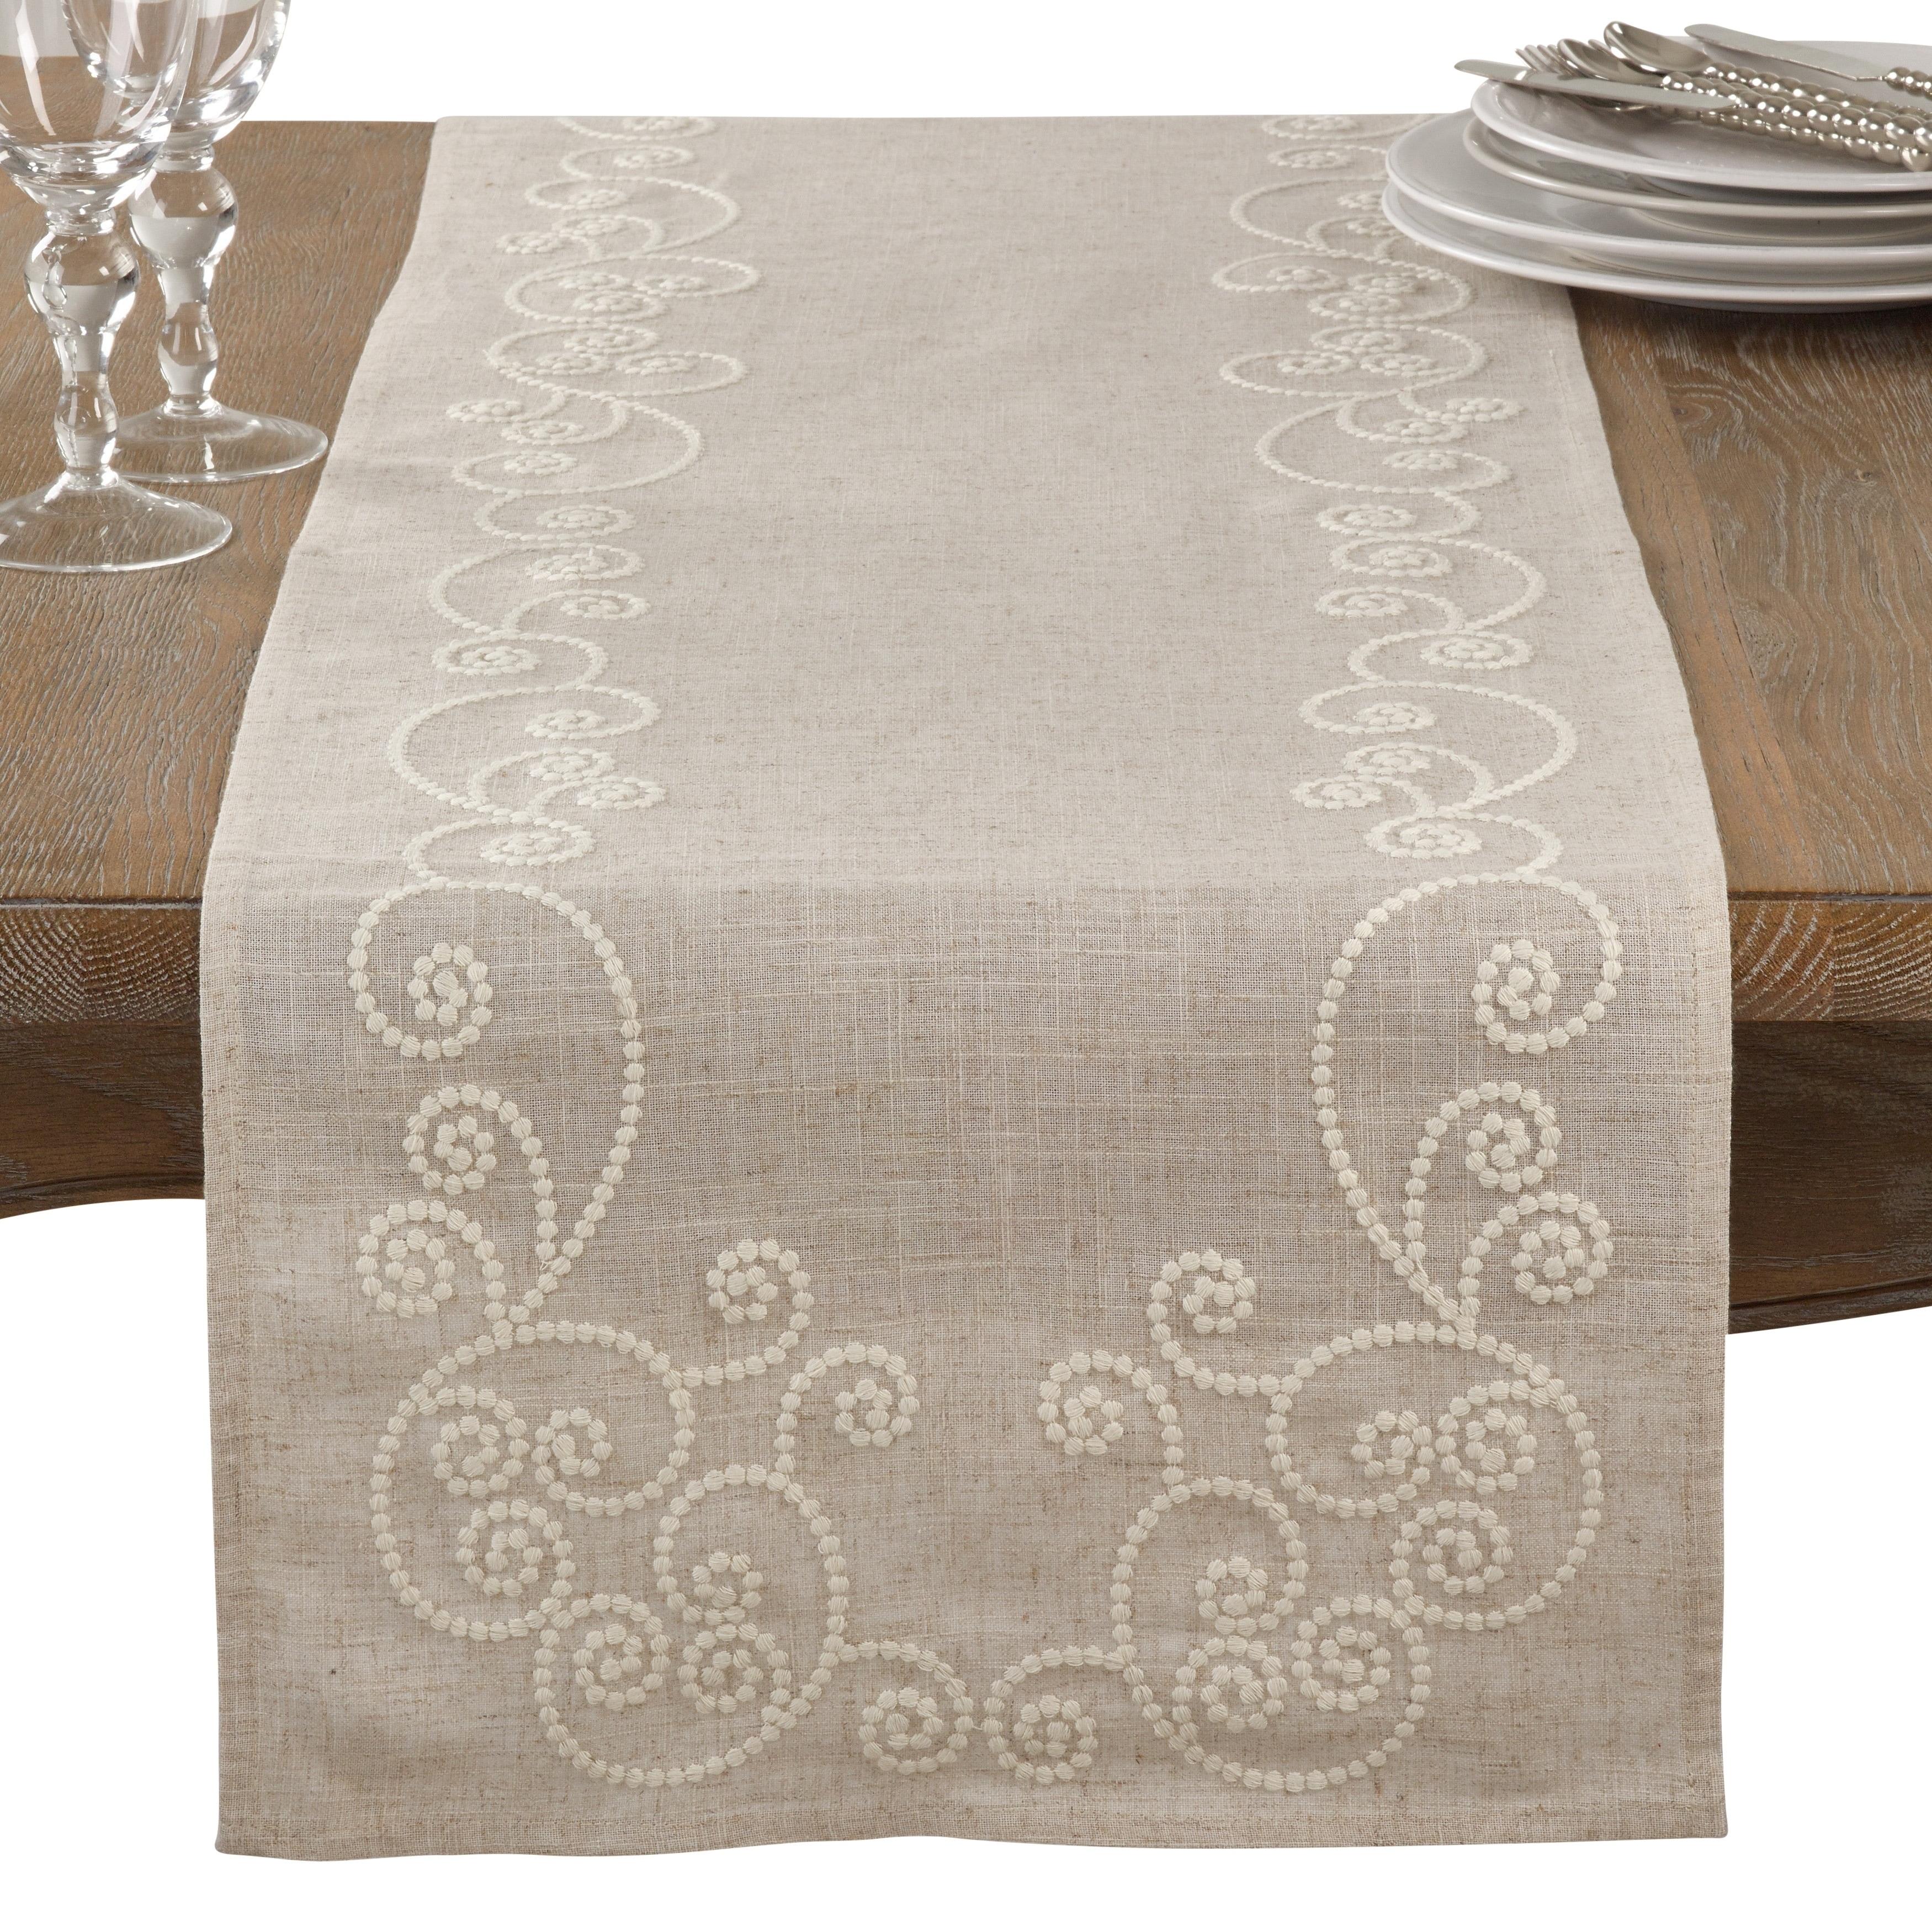 Embroidered Swirl Design Natural Linen Blend Table Runner Overstock 17522502